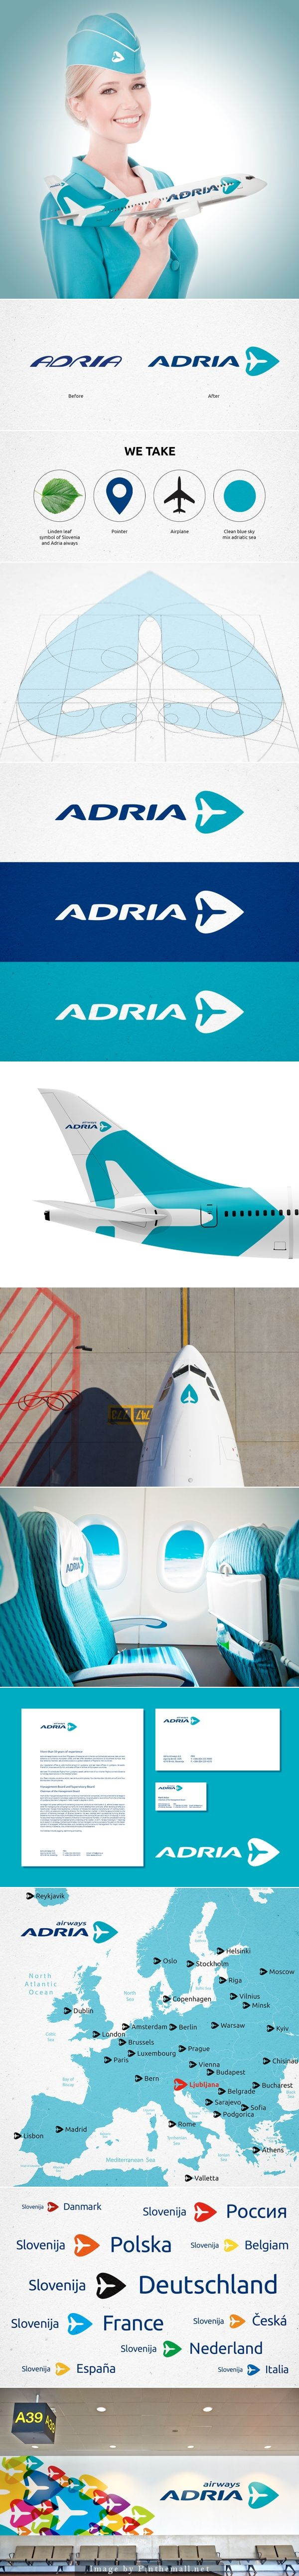 Adria Airways rebranding concept by Pit Palmer, via Behance